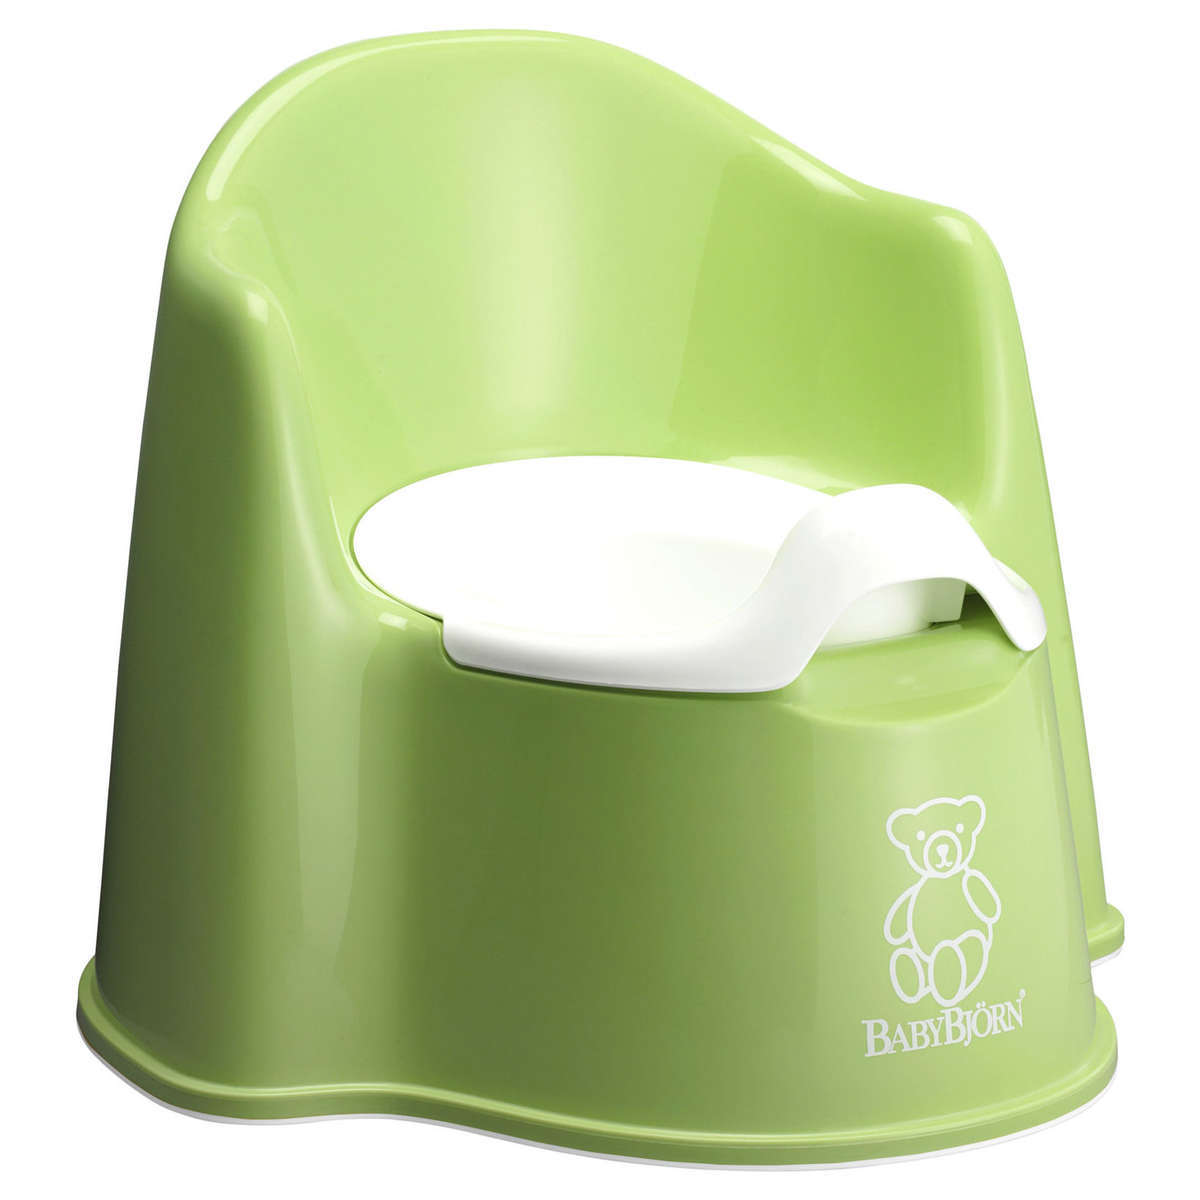 BabyBjörn Pot Fauteuil Vert Pot & Réducteur BabyBjörn sur L